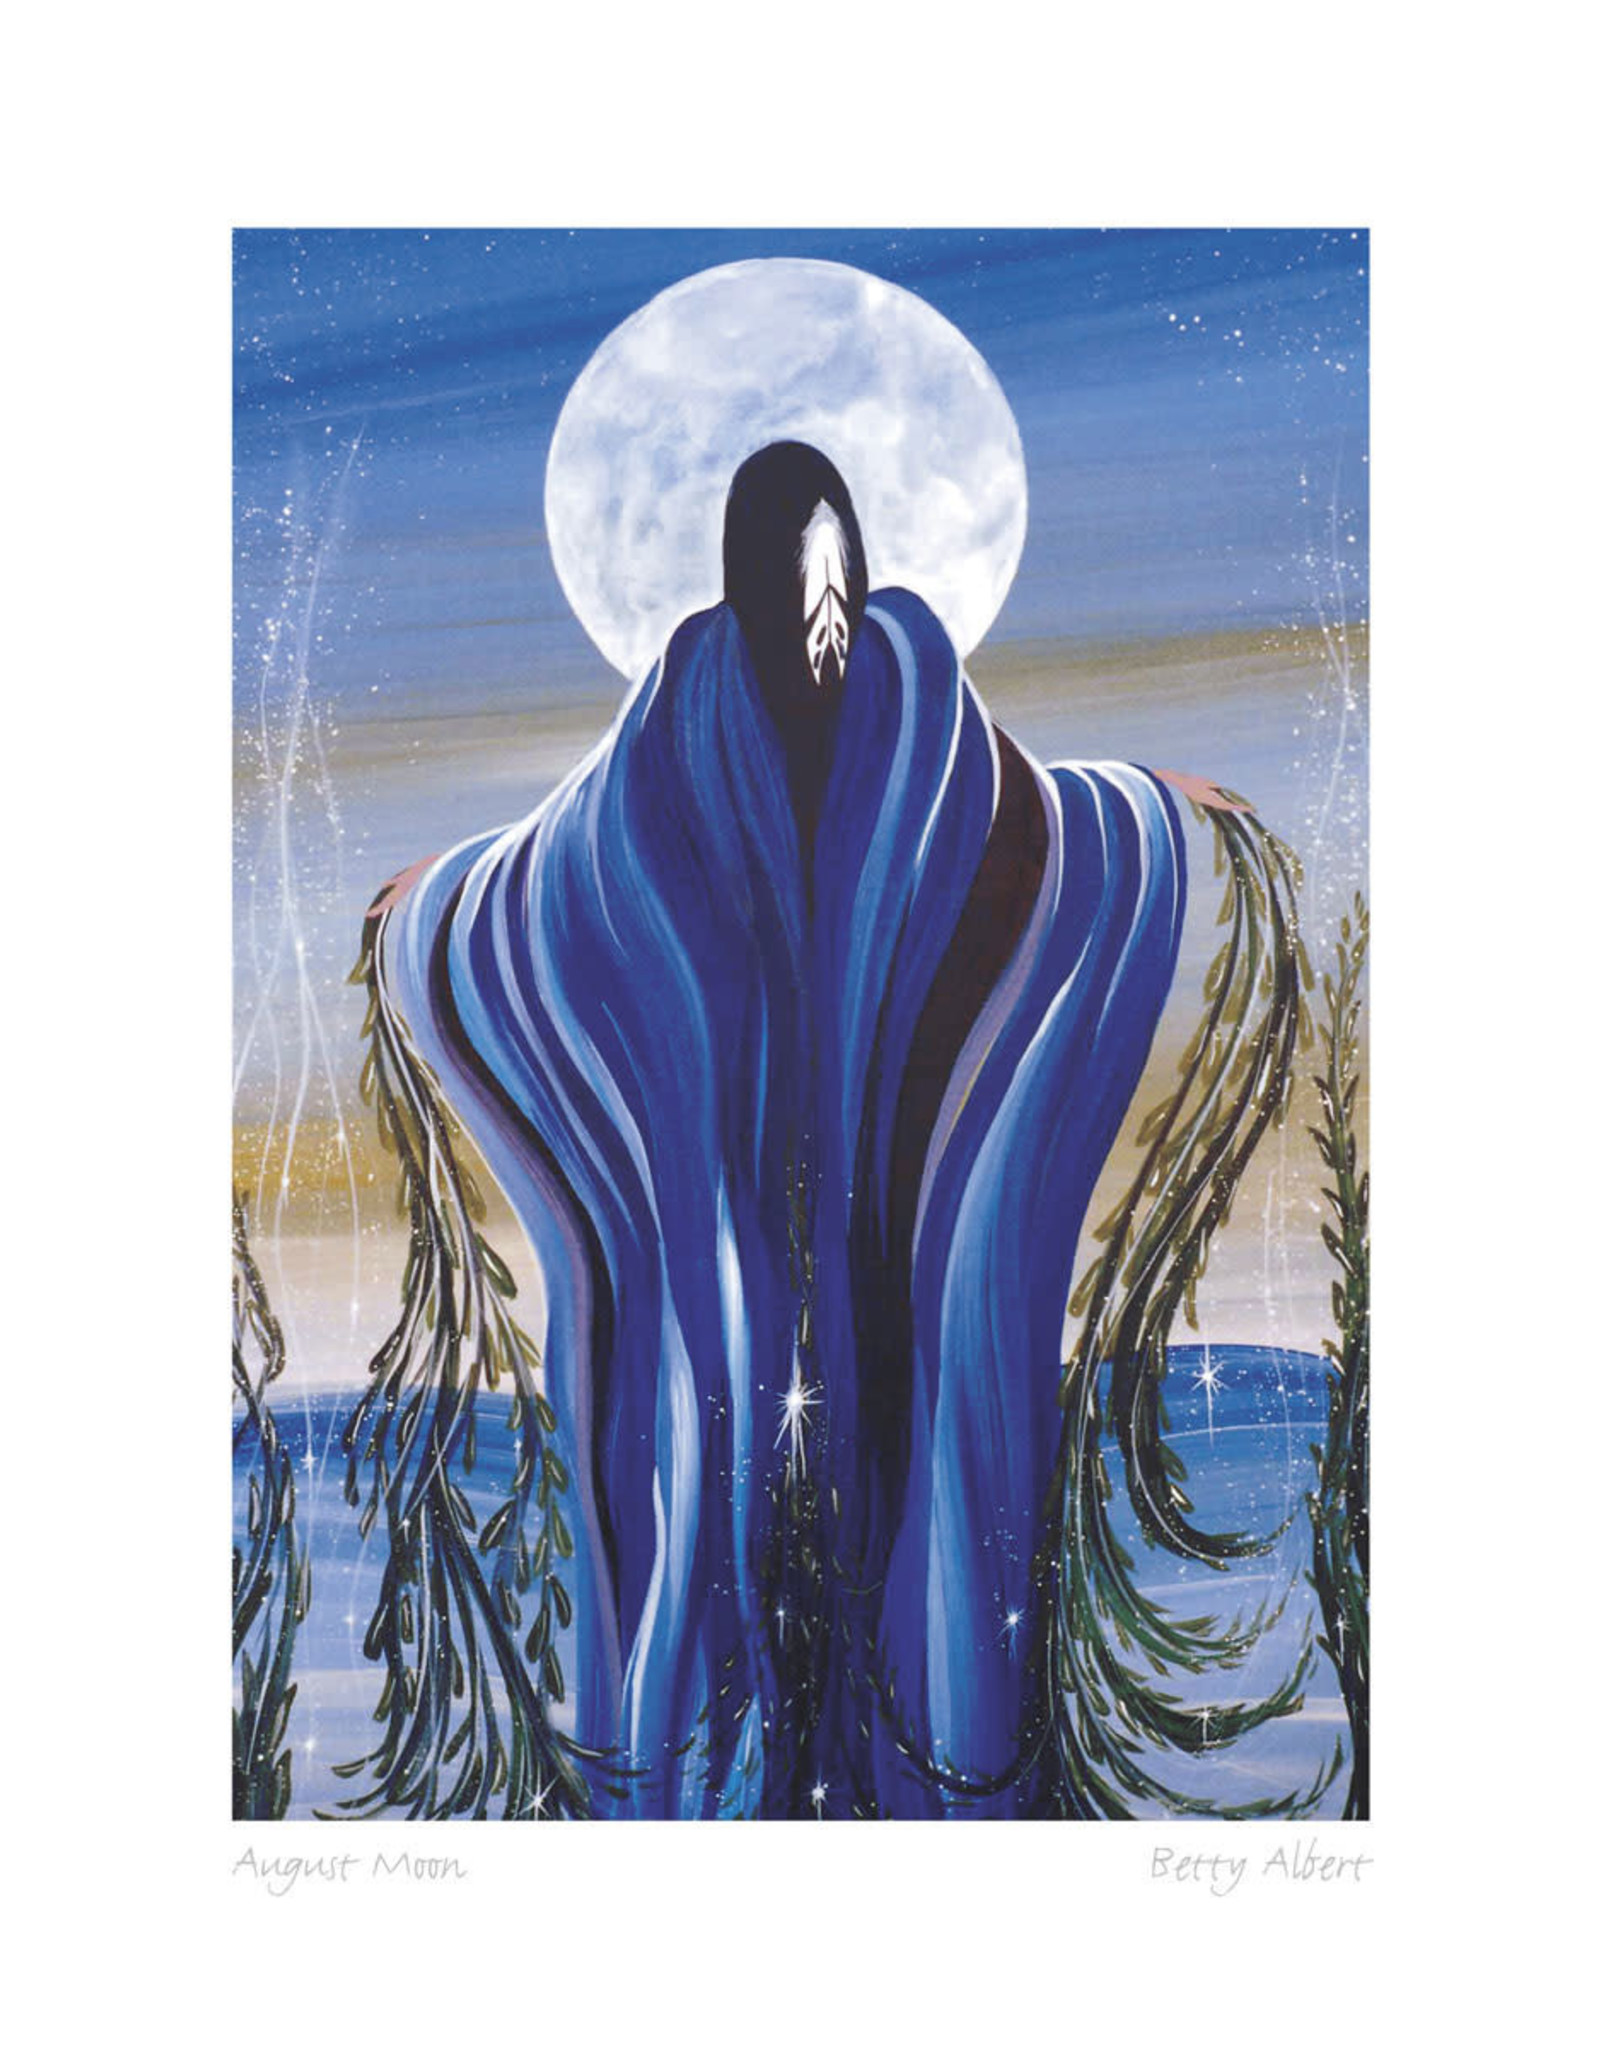 August Moon par Betty Albert Encadrée